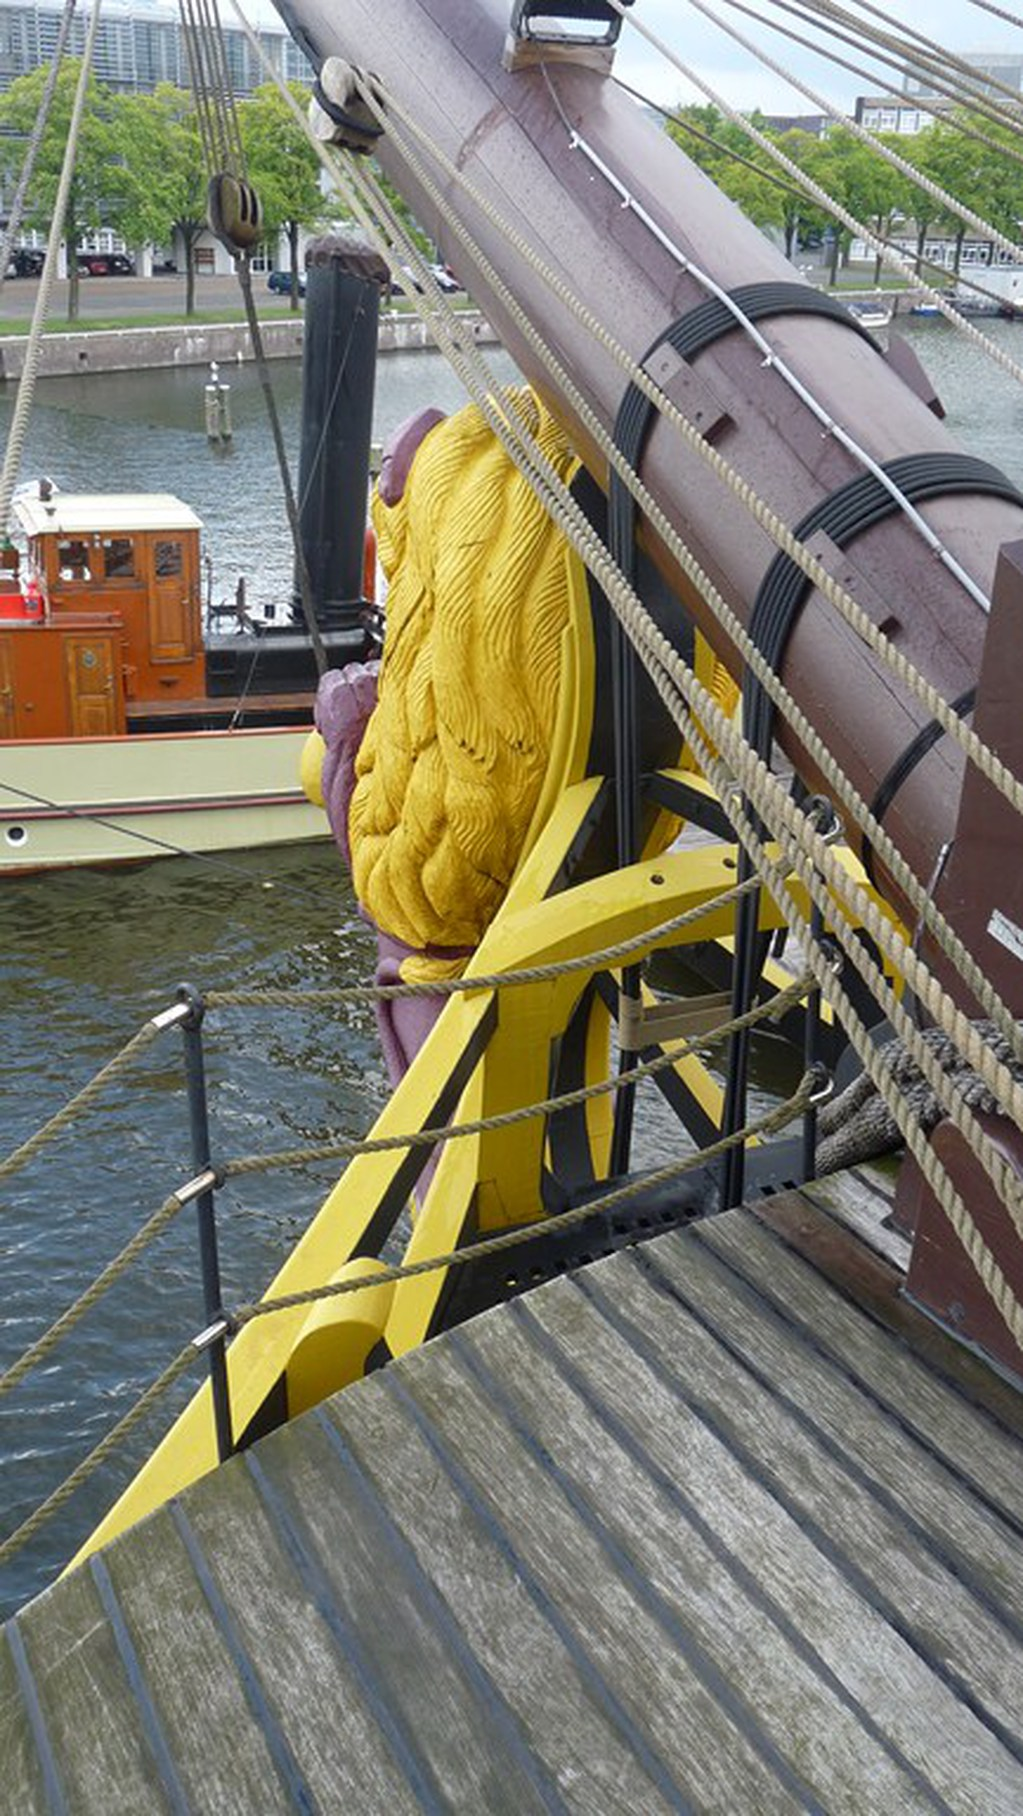 Visite du VOC « AMSTERDAM » (1749) à Amsterdam 17072807412023134915176633